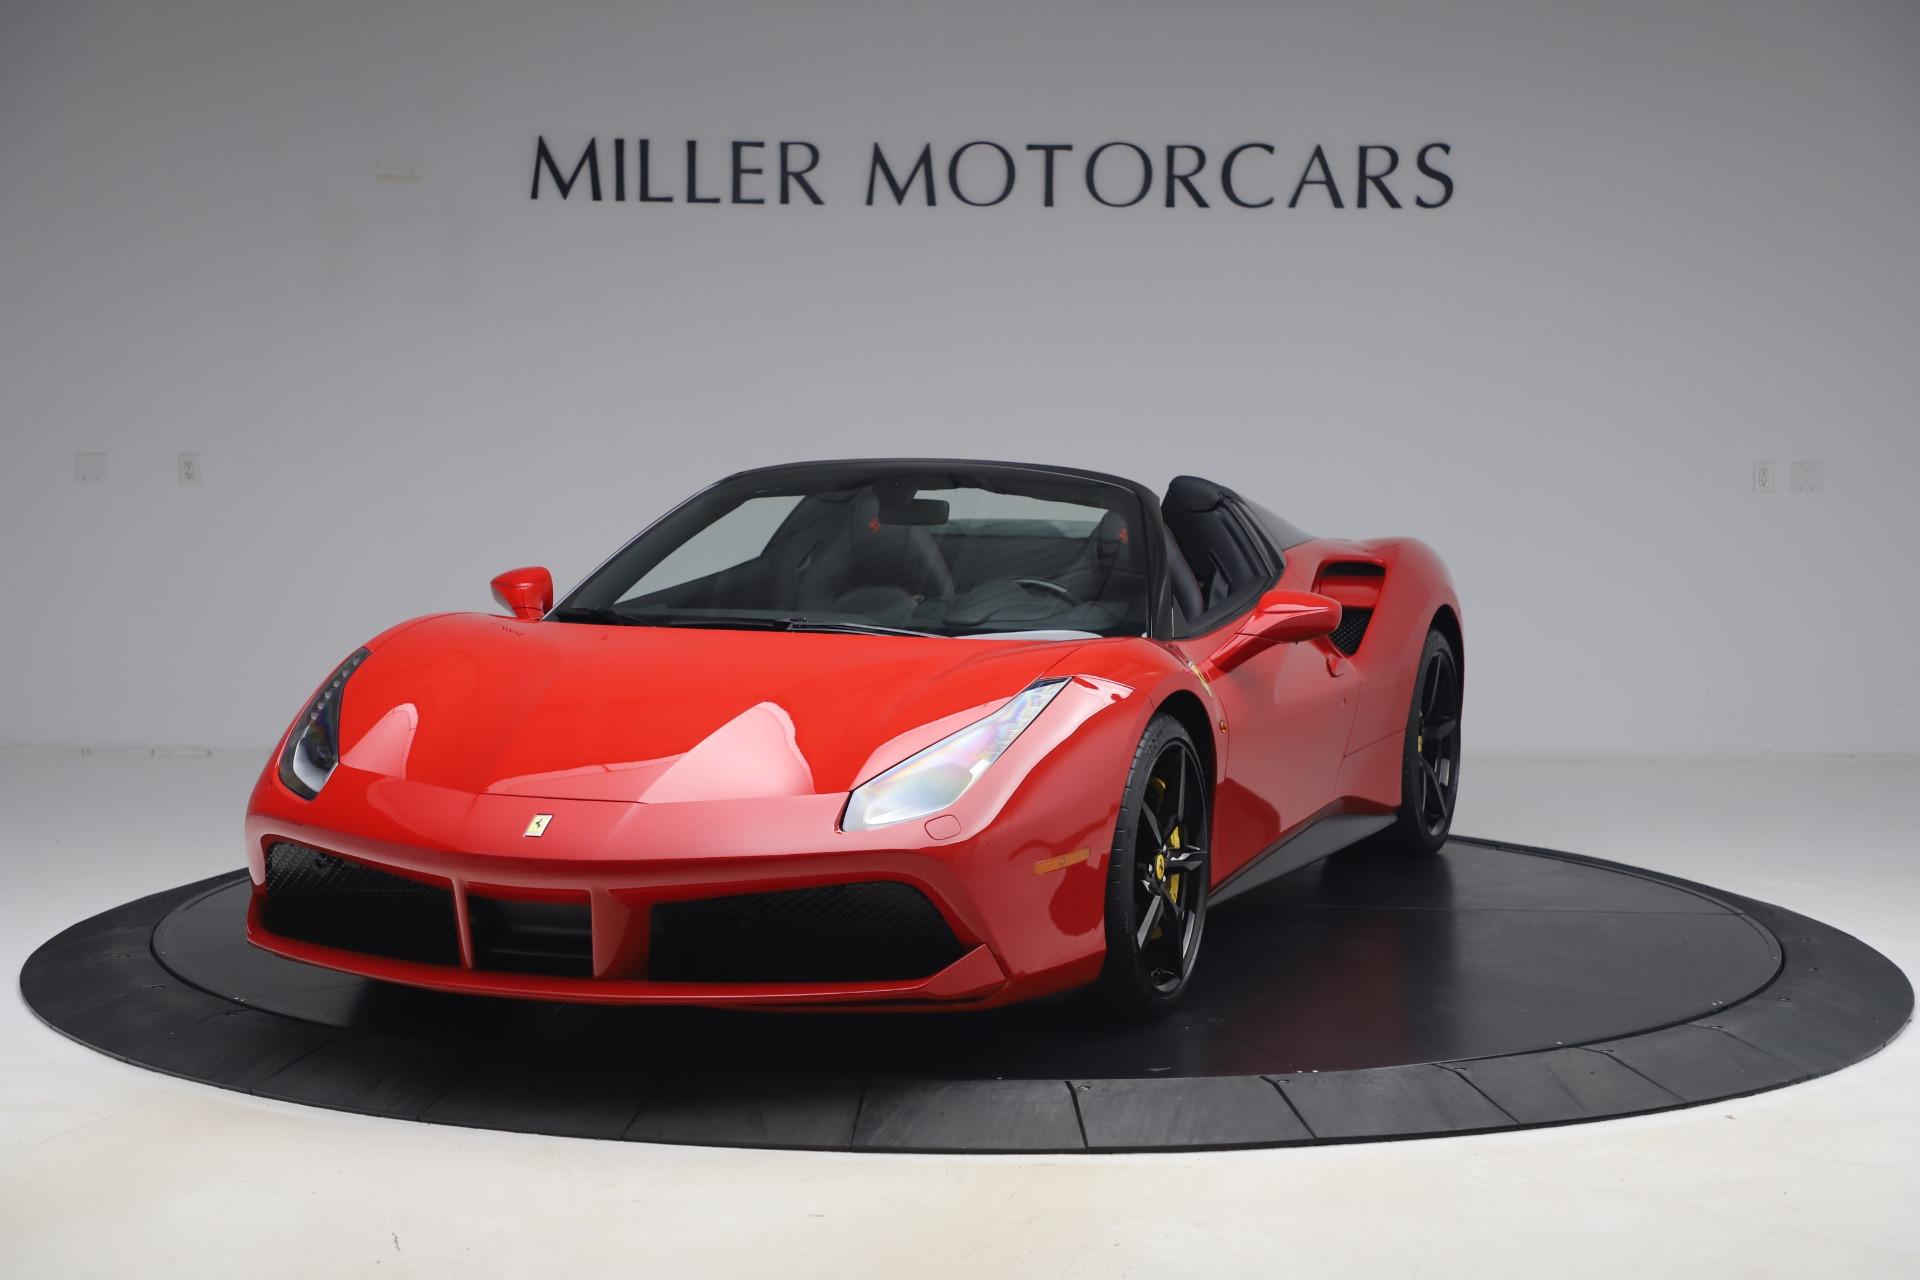 Used 2018 Ferrari 488 Spider for sale $286,900 at Alfa Romeo of Greenwich in Greenwich CT 06830 1